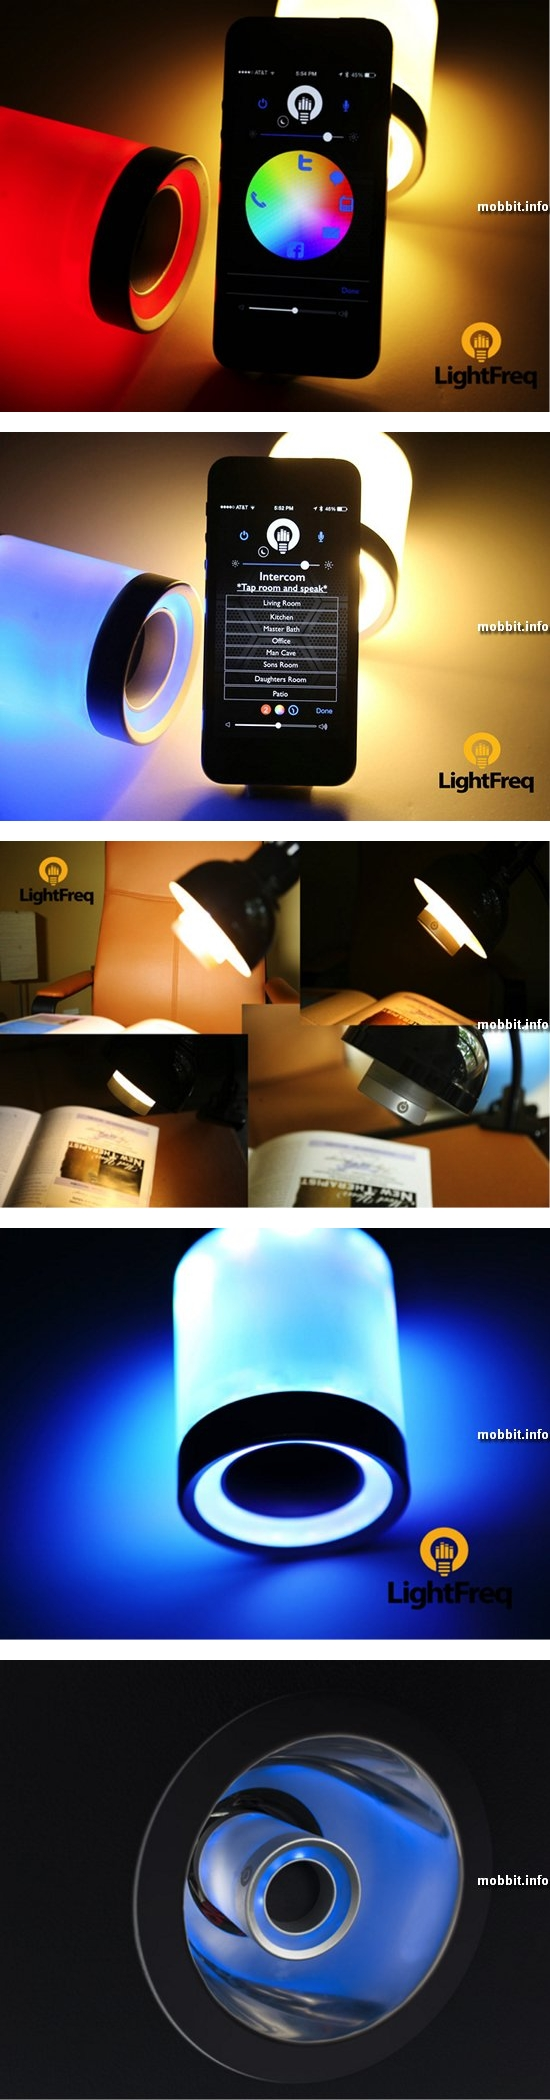 LightFreq